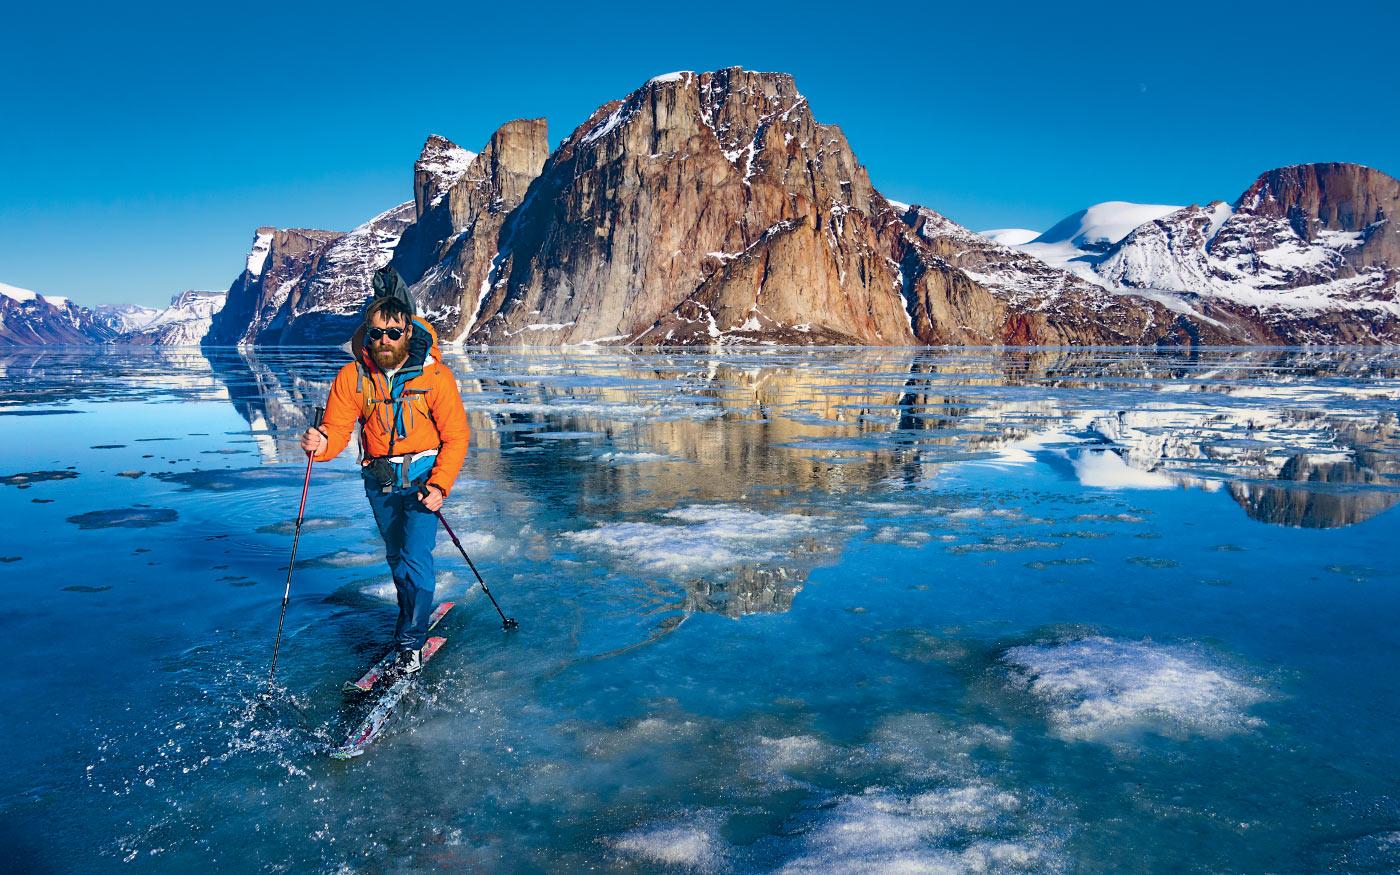 patagonia outdoor clothing u0026 gear